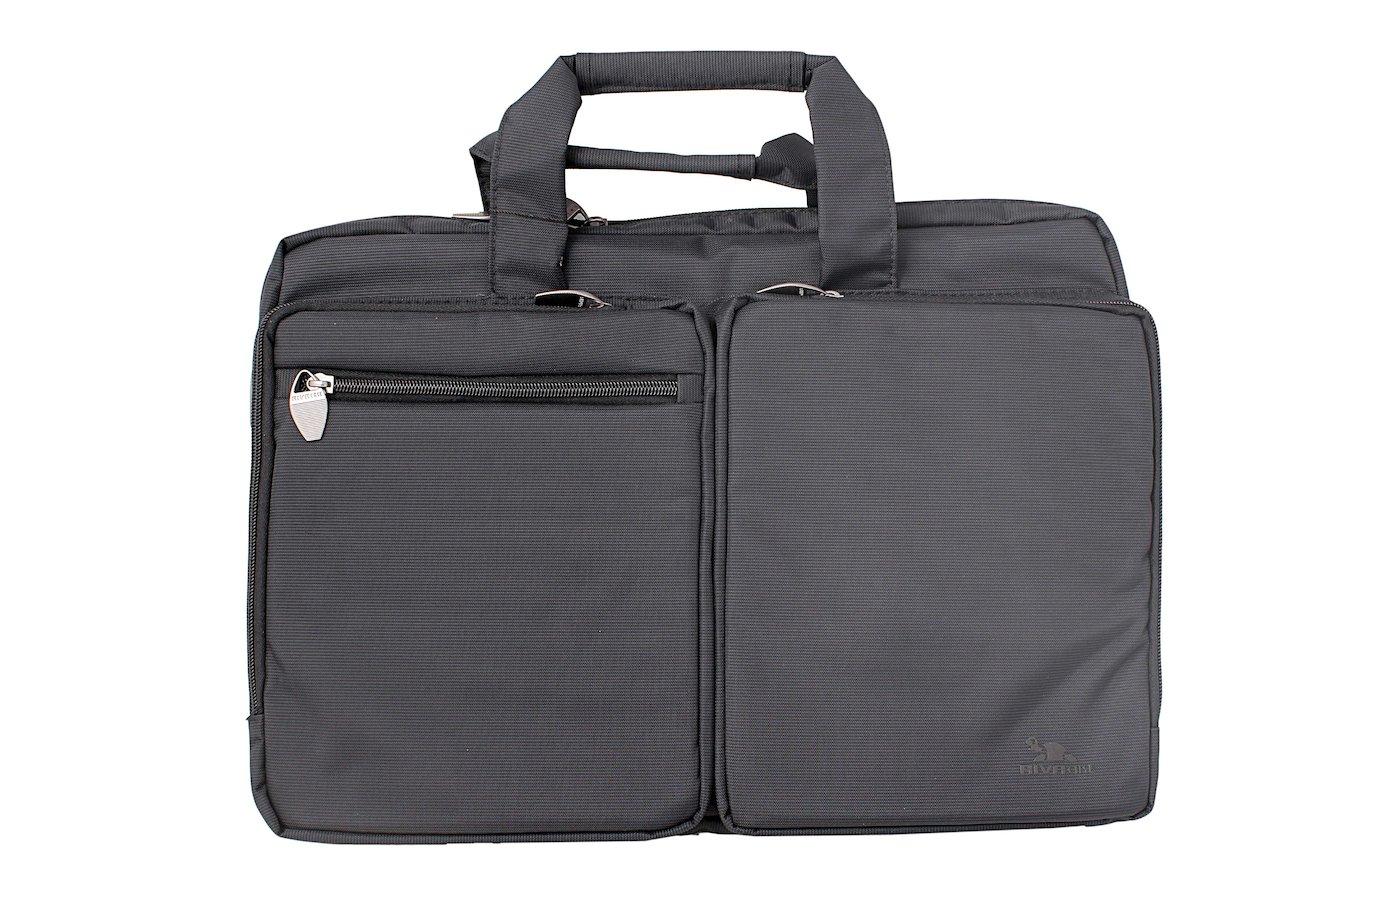 Кейс для ноутбука Riva Case 8530 black 16